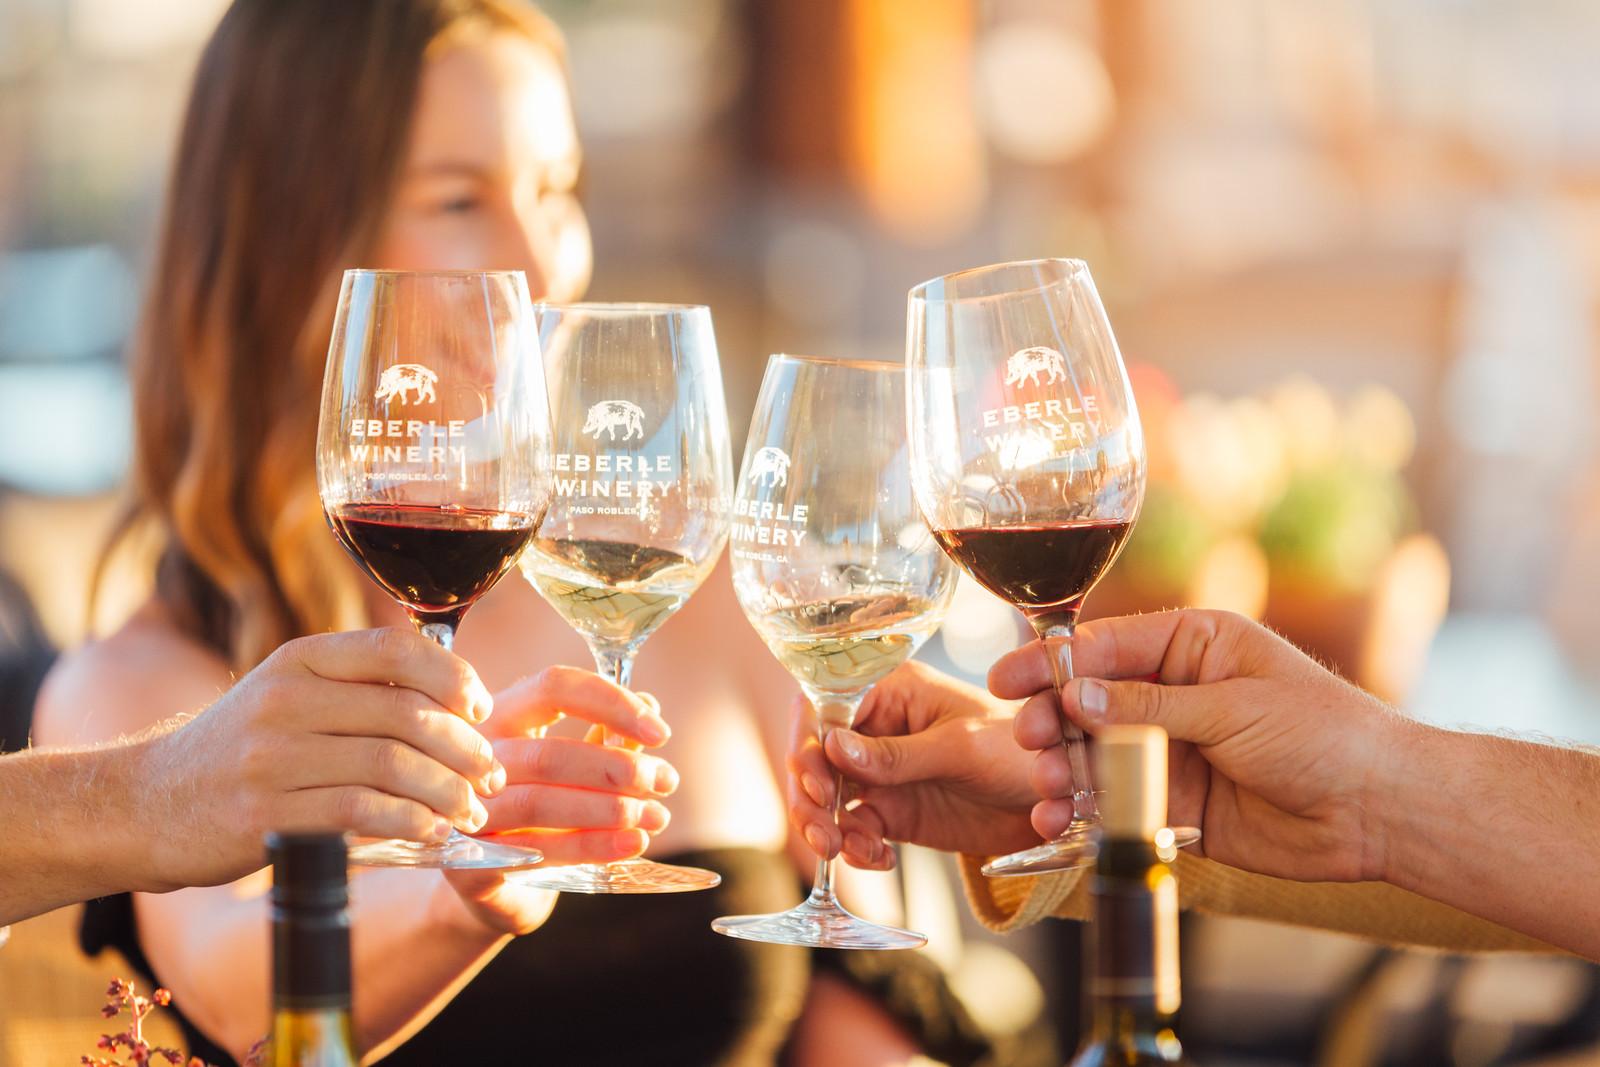 eberle wine glasses